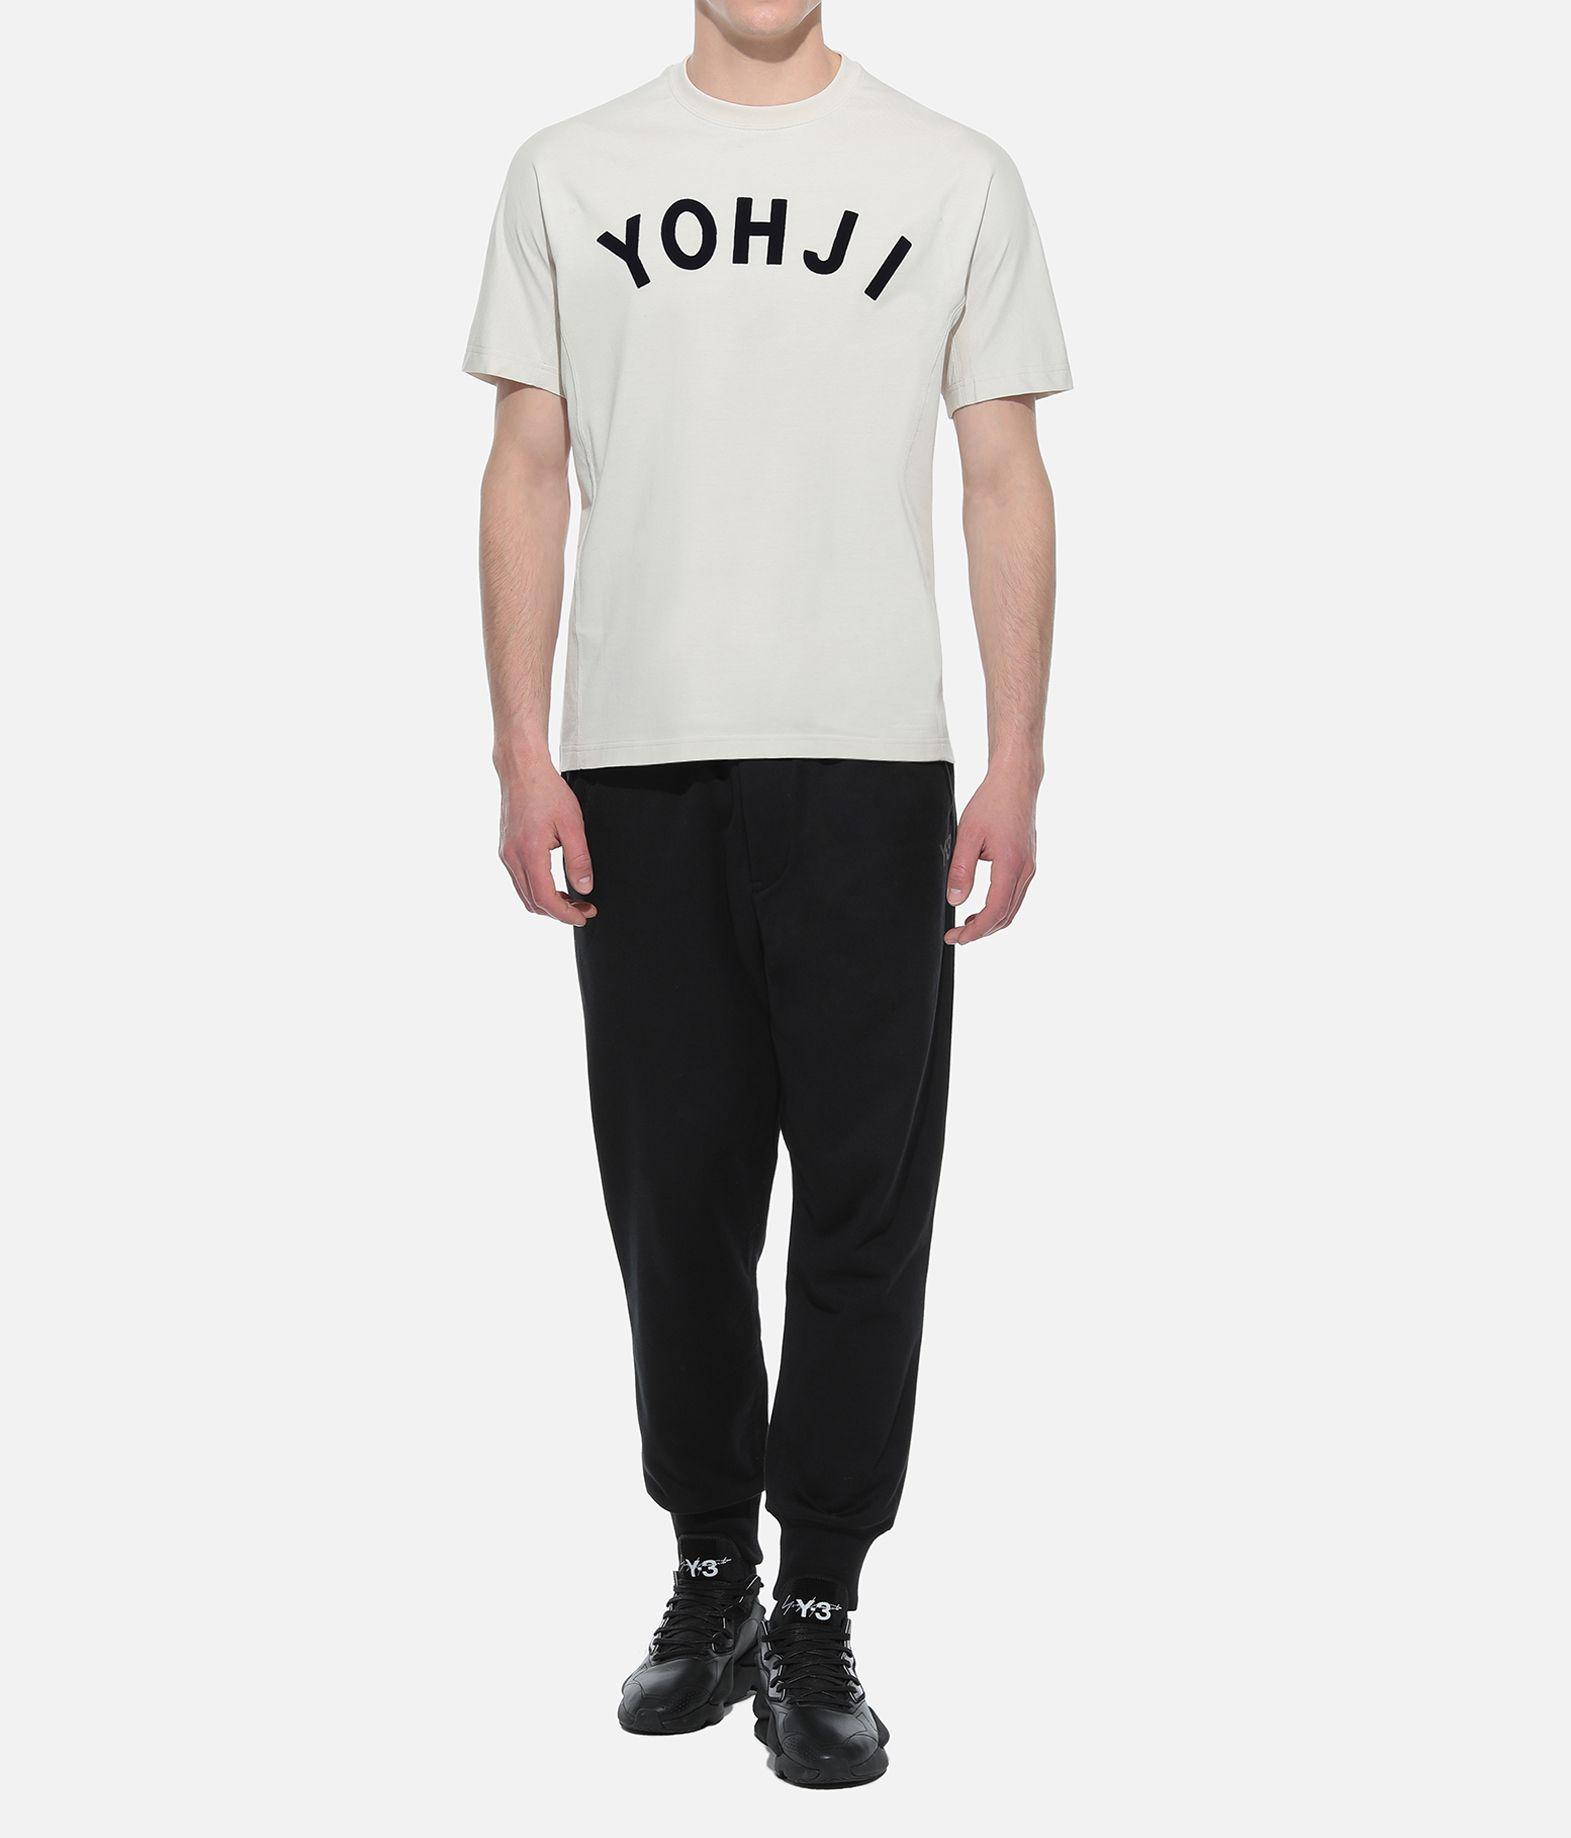 Y-3 Y-3 Yohji Letters Tee Short sleeve t-shirt Man a